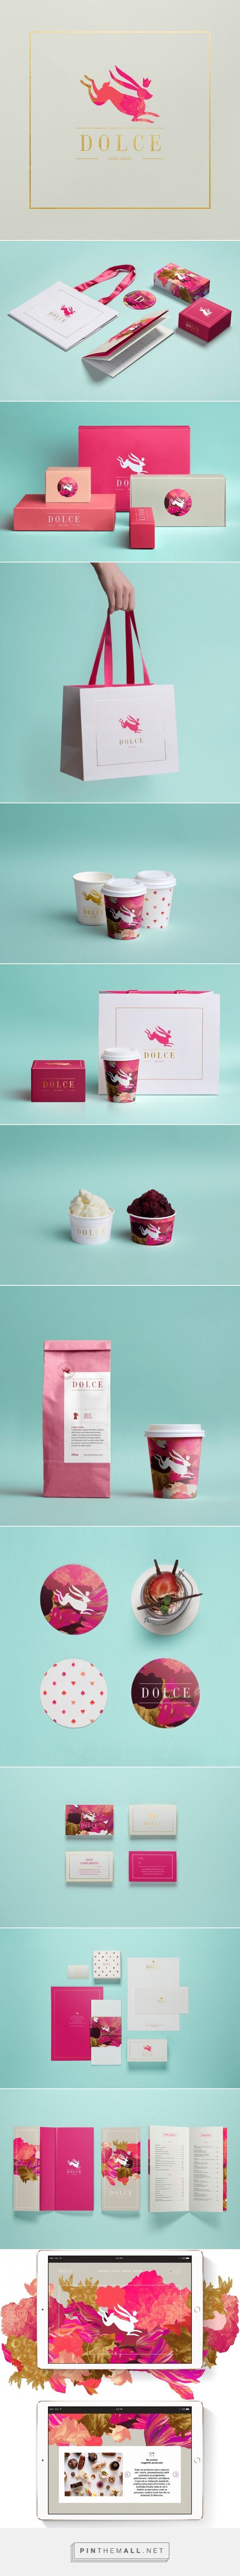 Dolce Branding by Metaklinika | Fivestar Branding – Design and Branding Agency & Inspiration Gallery